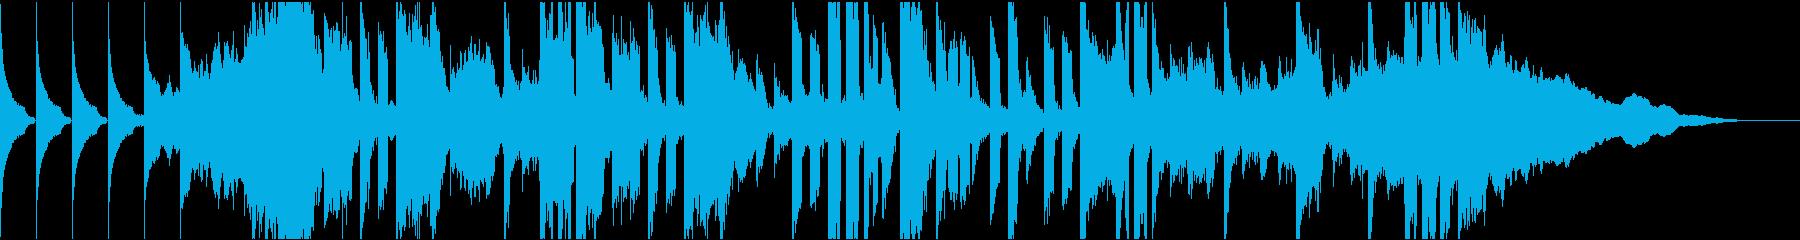 DJスクラッチと女性ヴォーカルのジングルの再生済みの波形